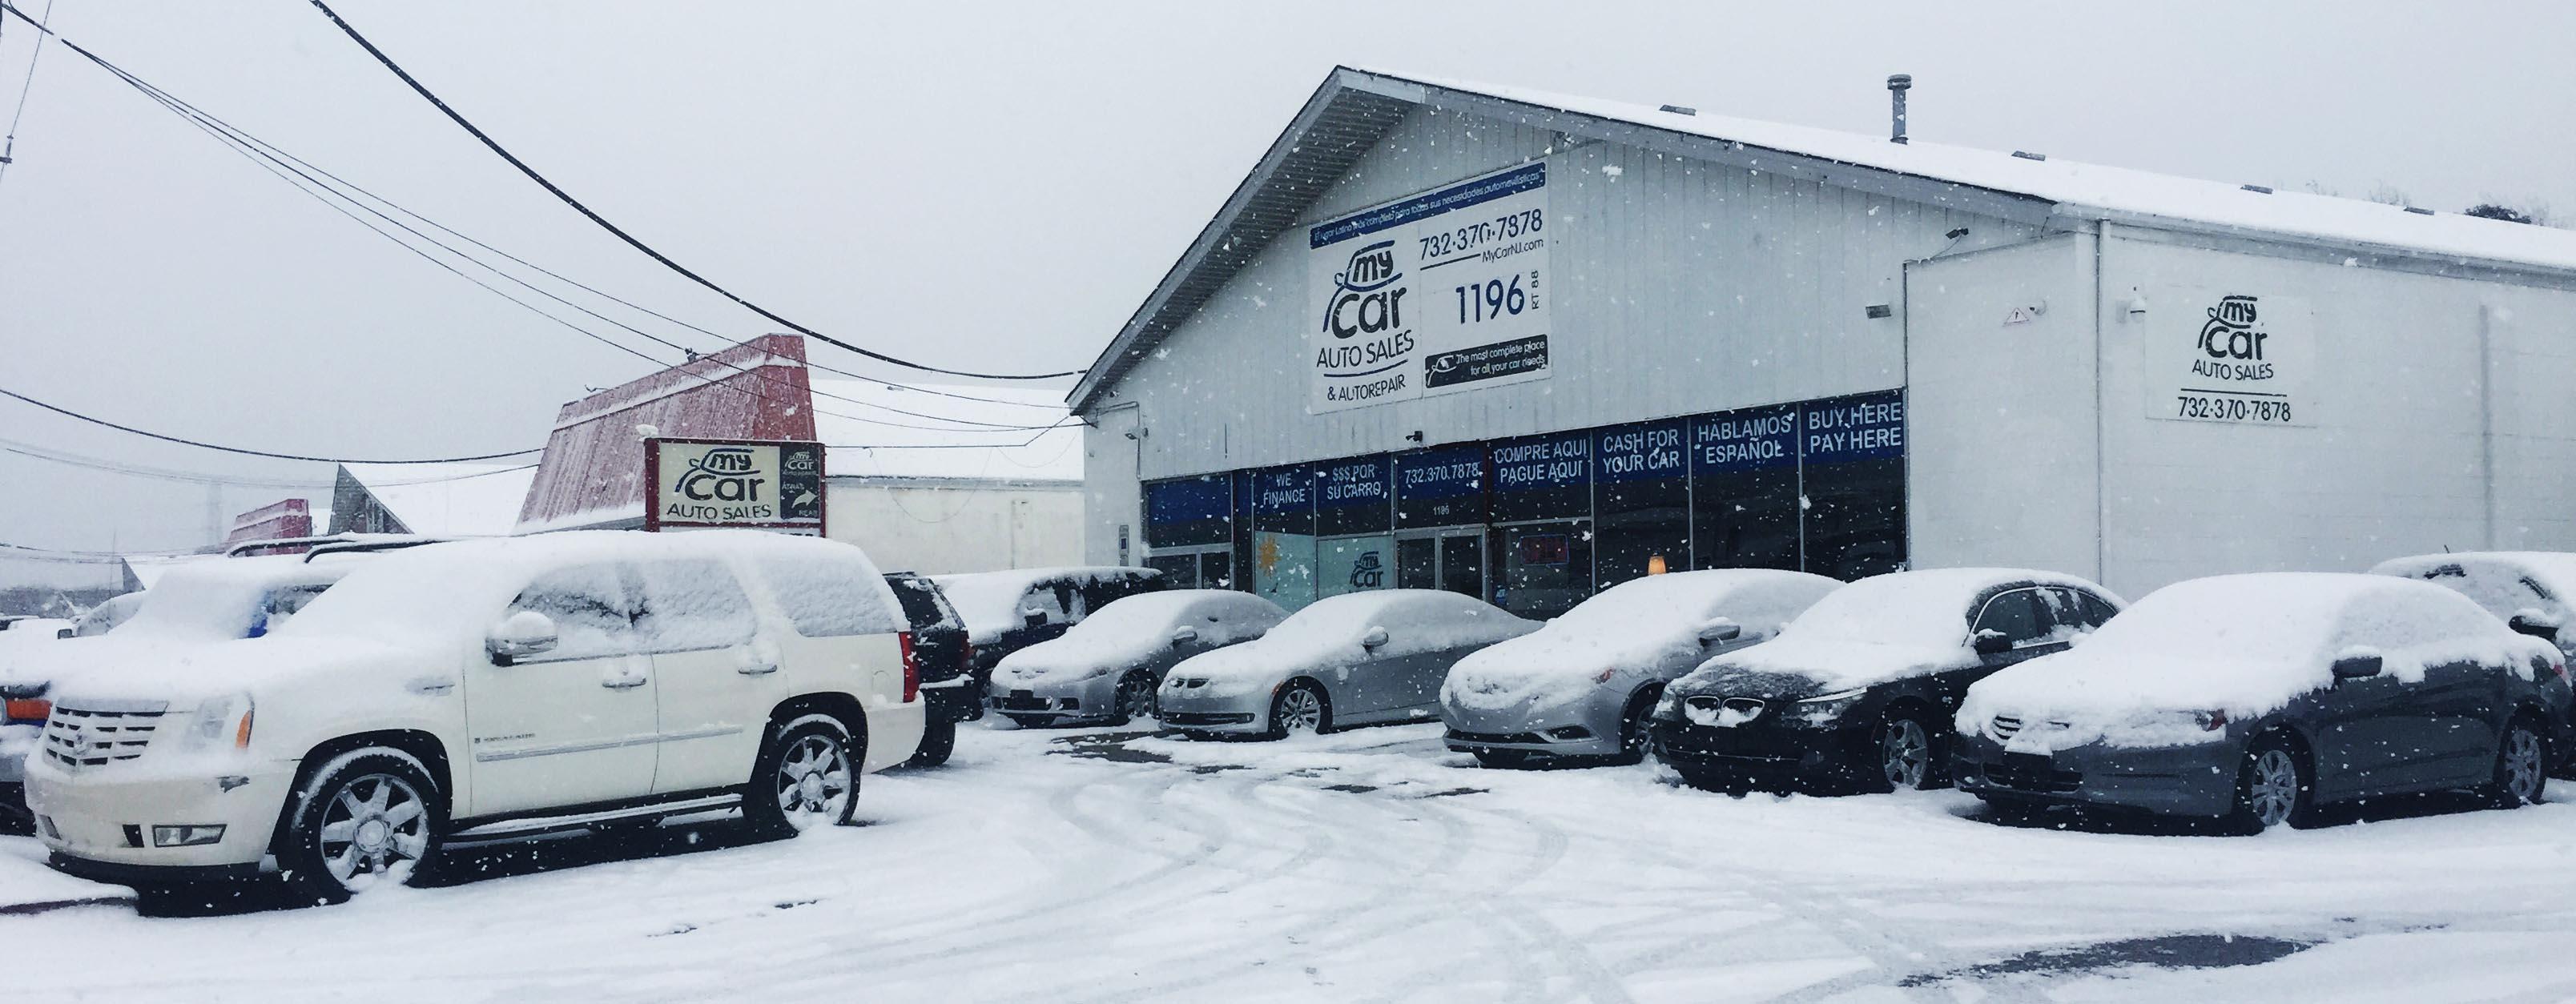 Toyota Lakewood Nj >> My Car Auto Sales   Lakewood, NJ 08701